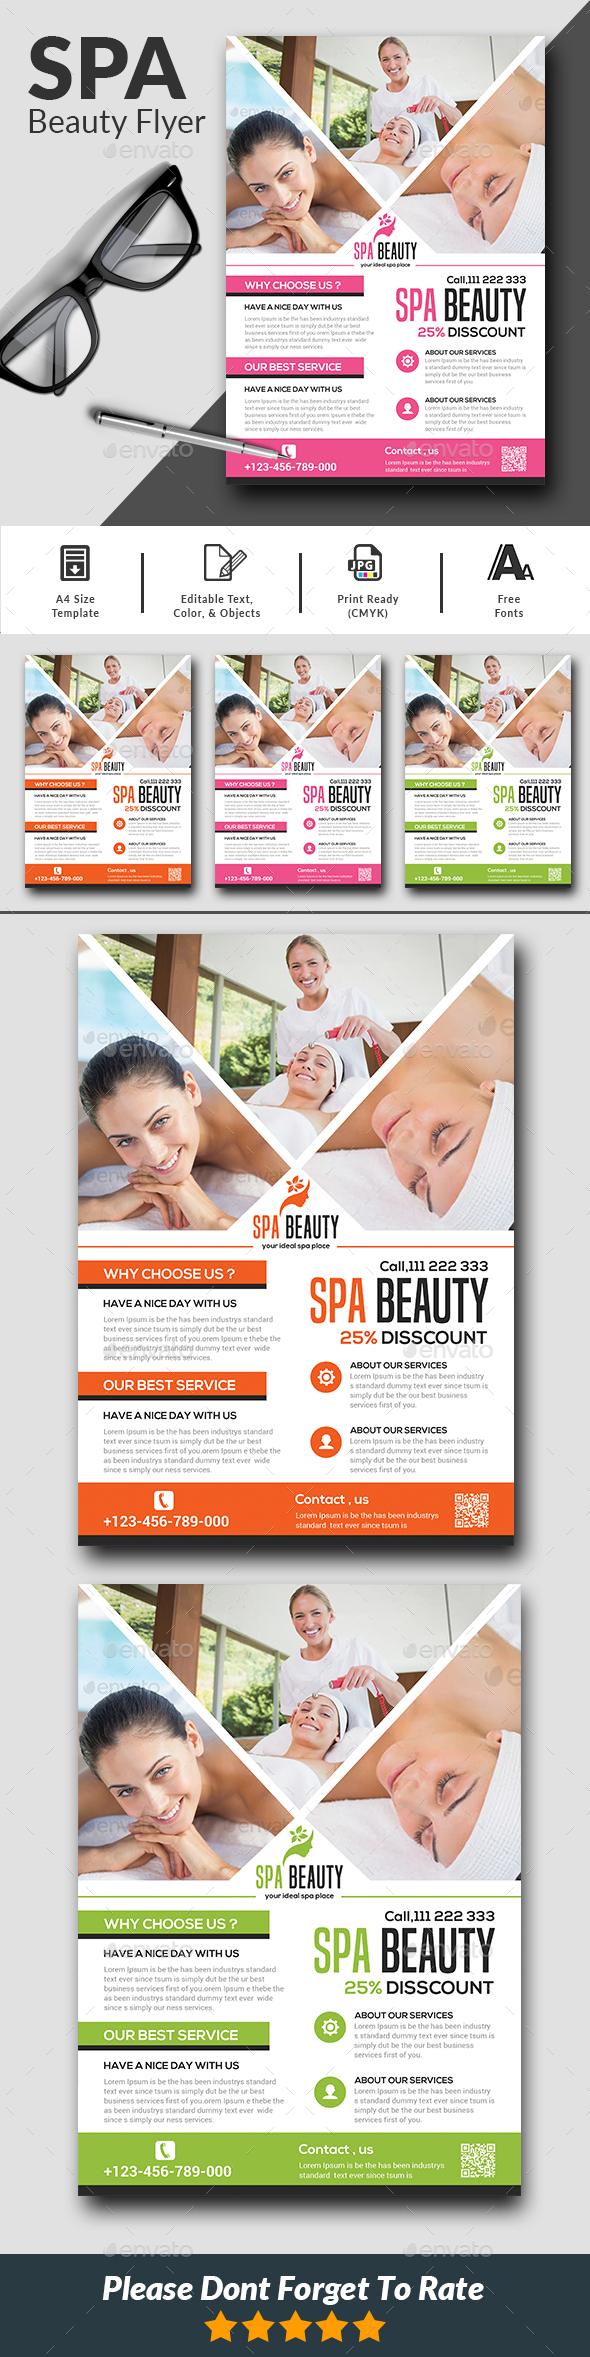 GraphicRiver Beauty Salon Spa Flyer 21104128